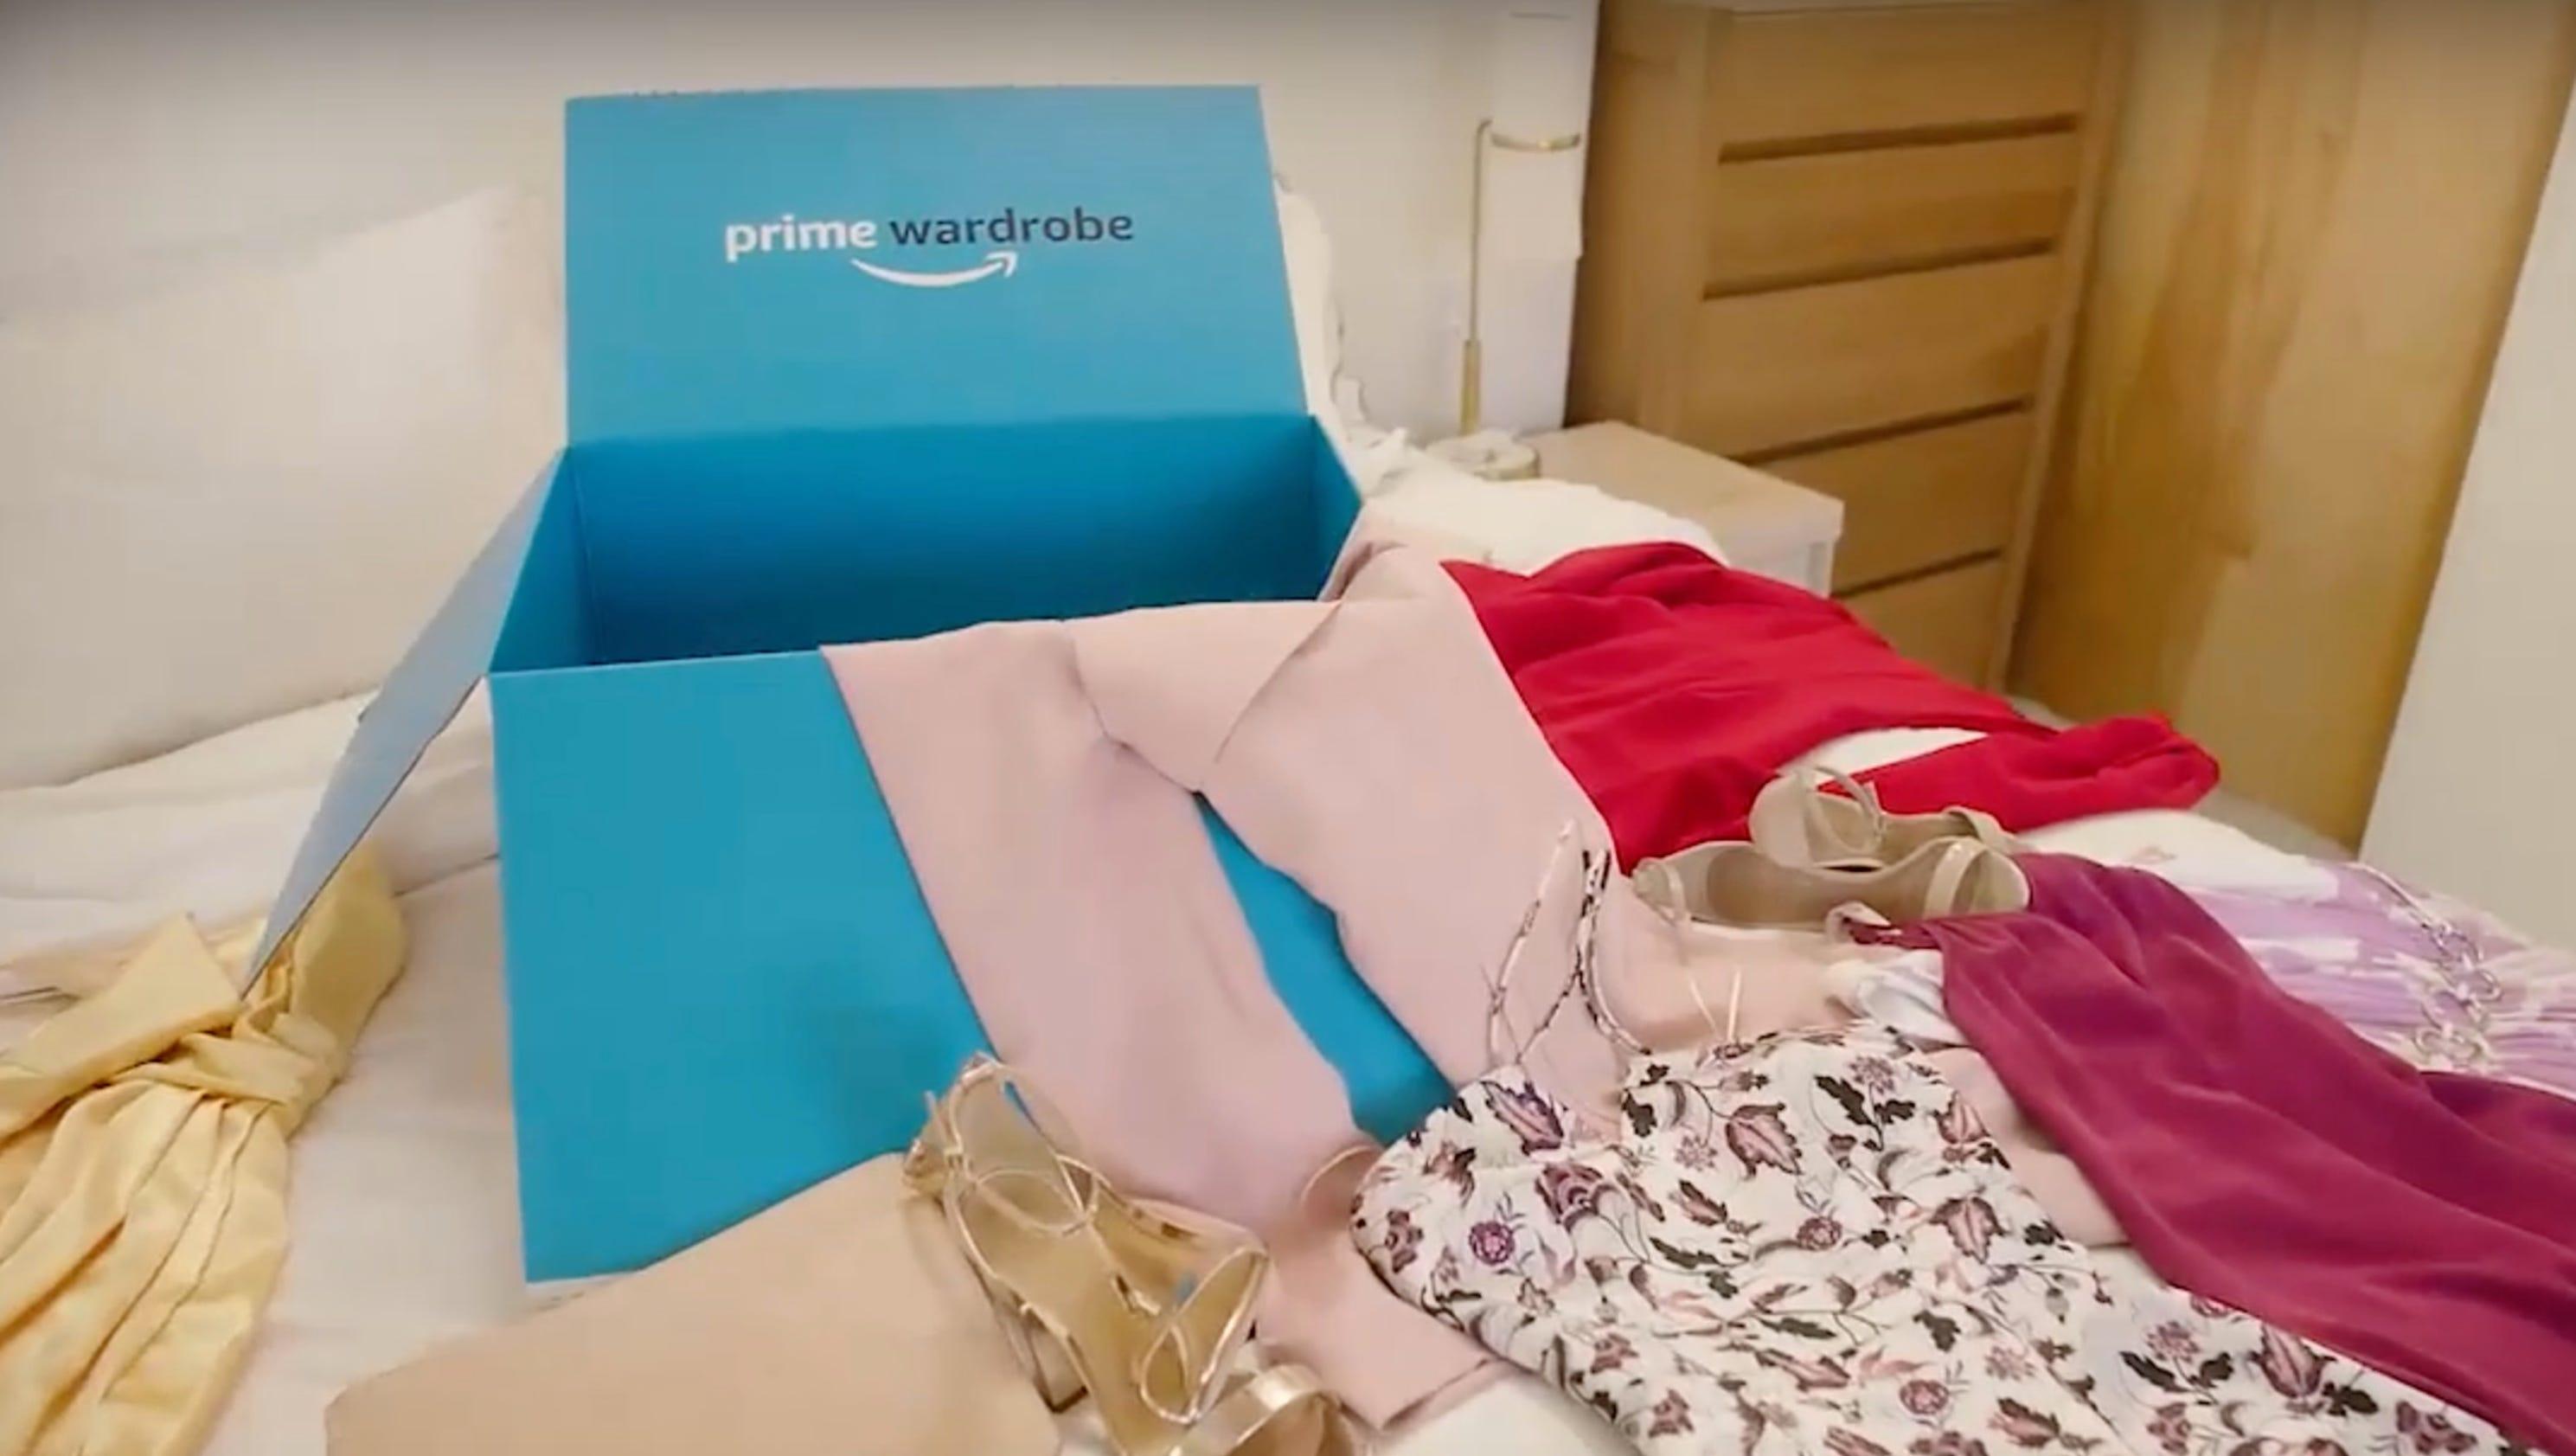 at wardrobe p pinterest pin tal wardrober sale skirt taylor off tally checkout htm piece taken suit com